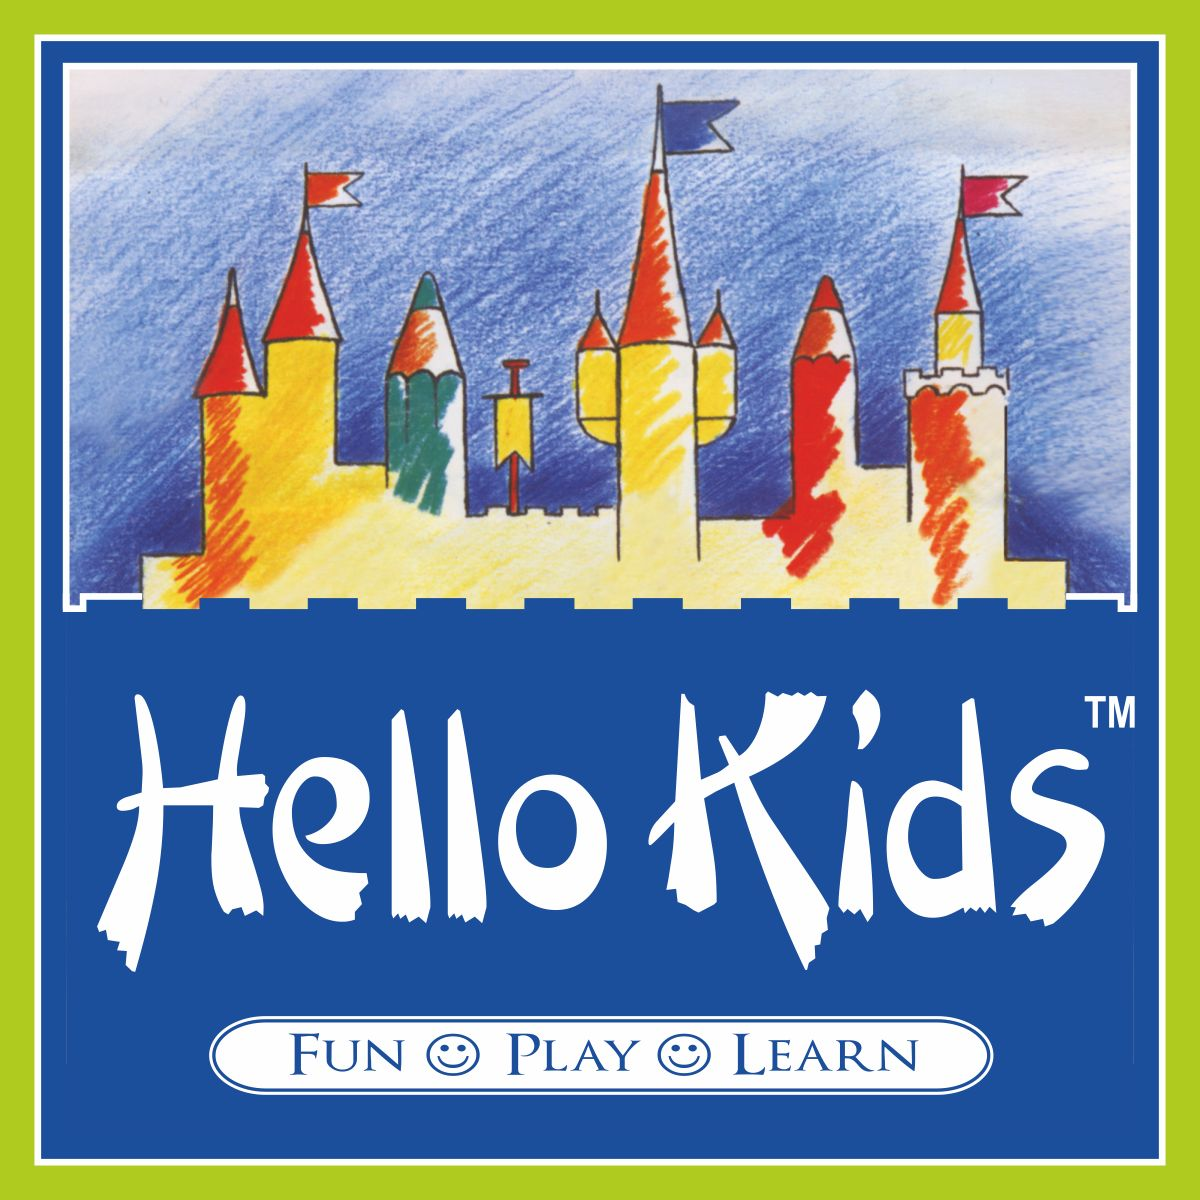 Hello Kids - Sector 7 - Faridabad Image